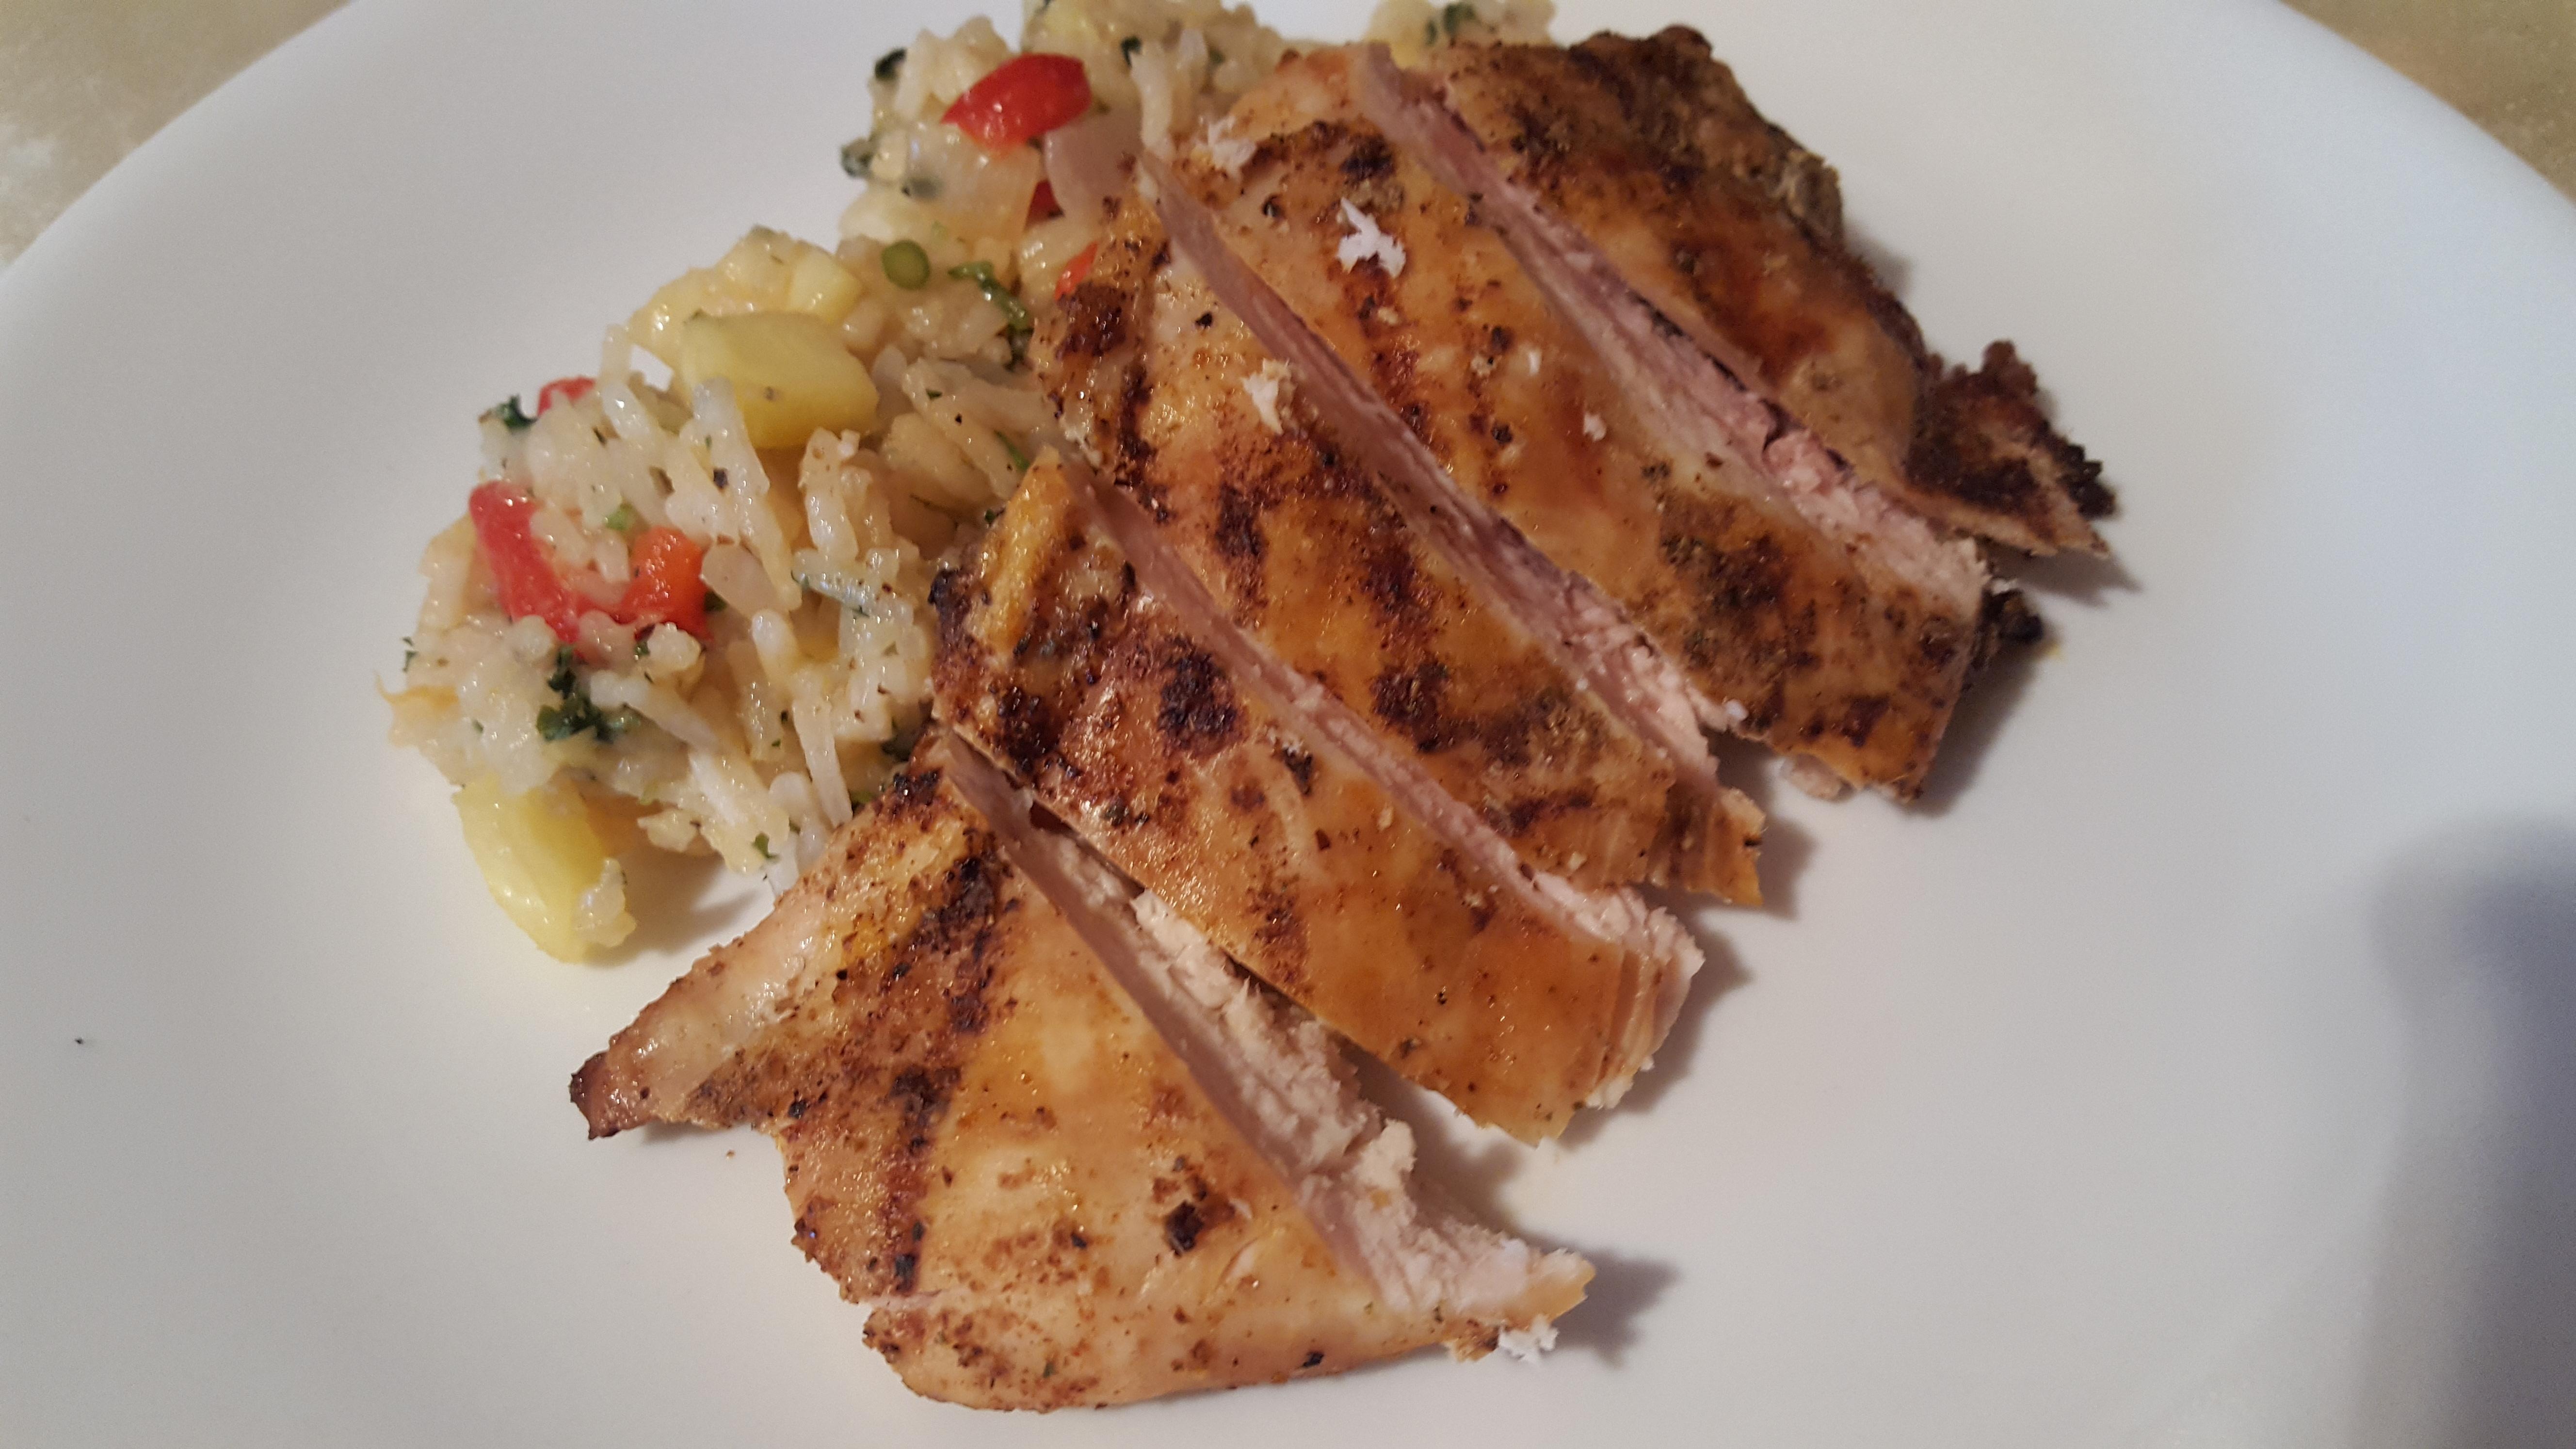 Caribbean Chicken with Pineapple-Cilantro Rice Christopher Loeb